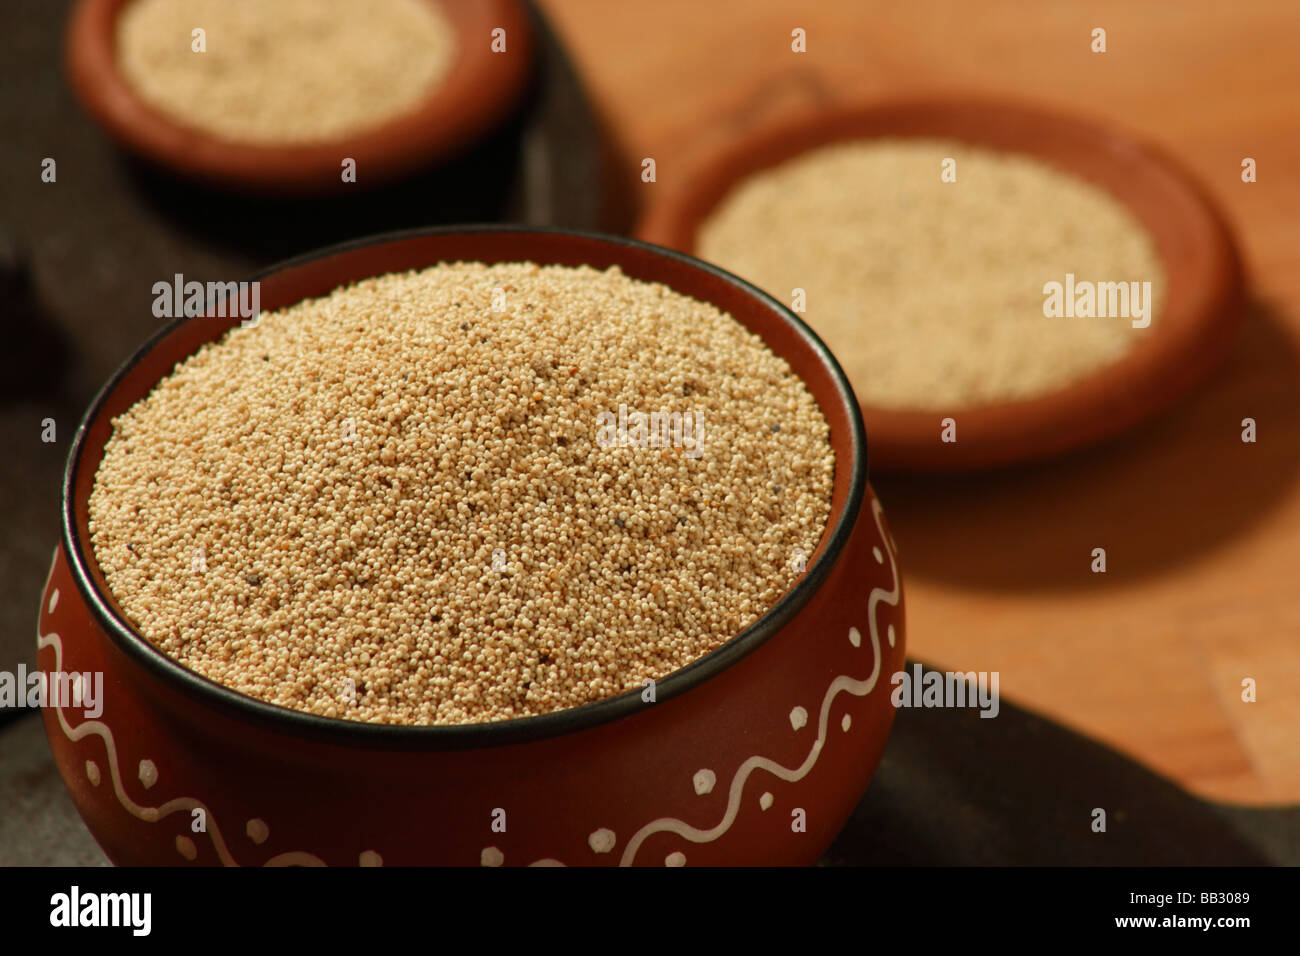 Europe Spices Oil Seeds Stock Photos & Europe Spices Oil Seeds Stock